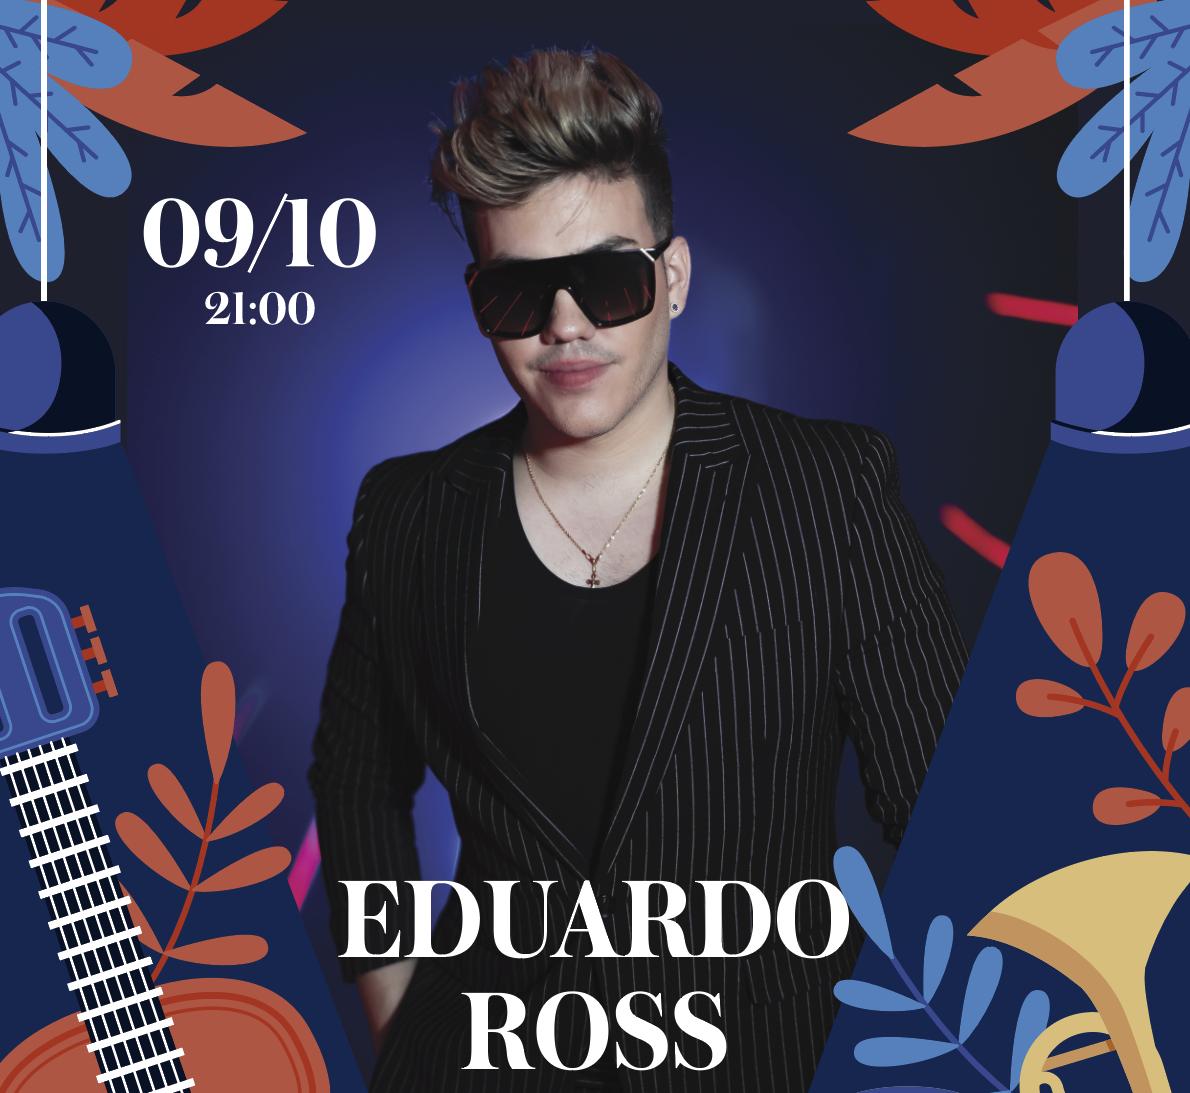 Афиша! 09 октября — Eduardo Ross в Embers Speakeasy.